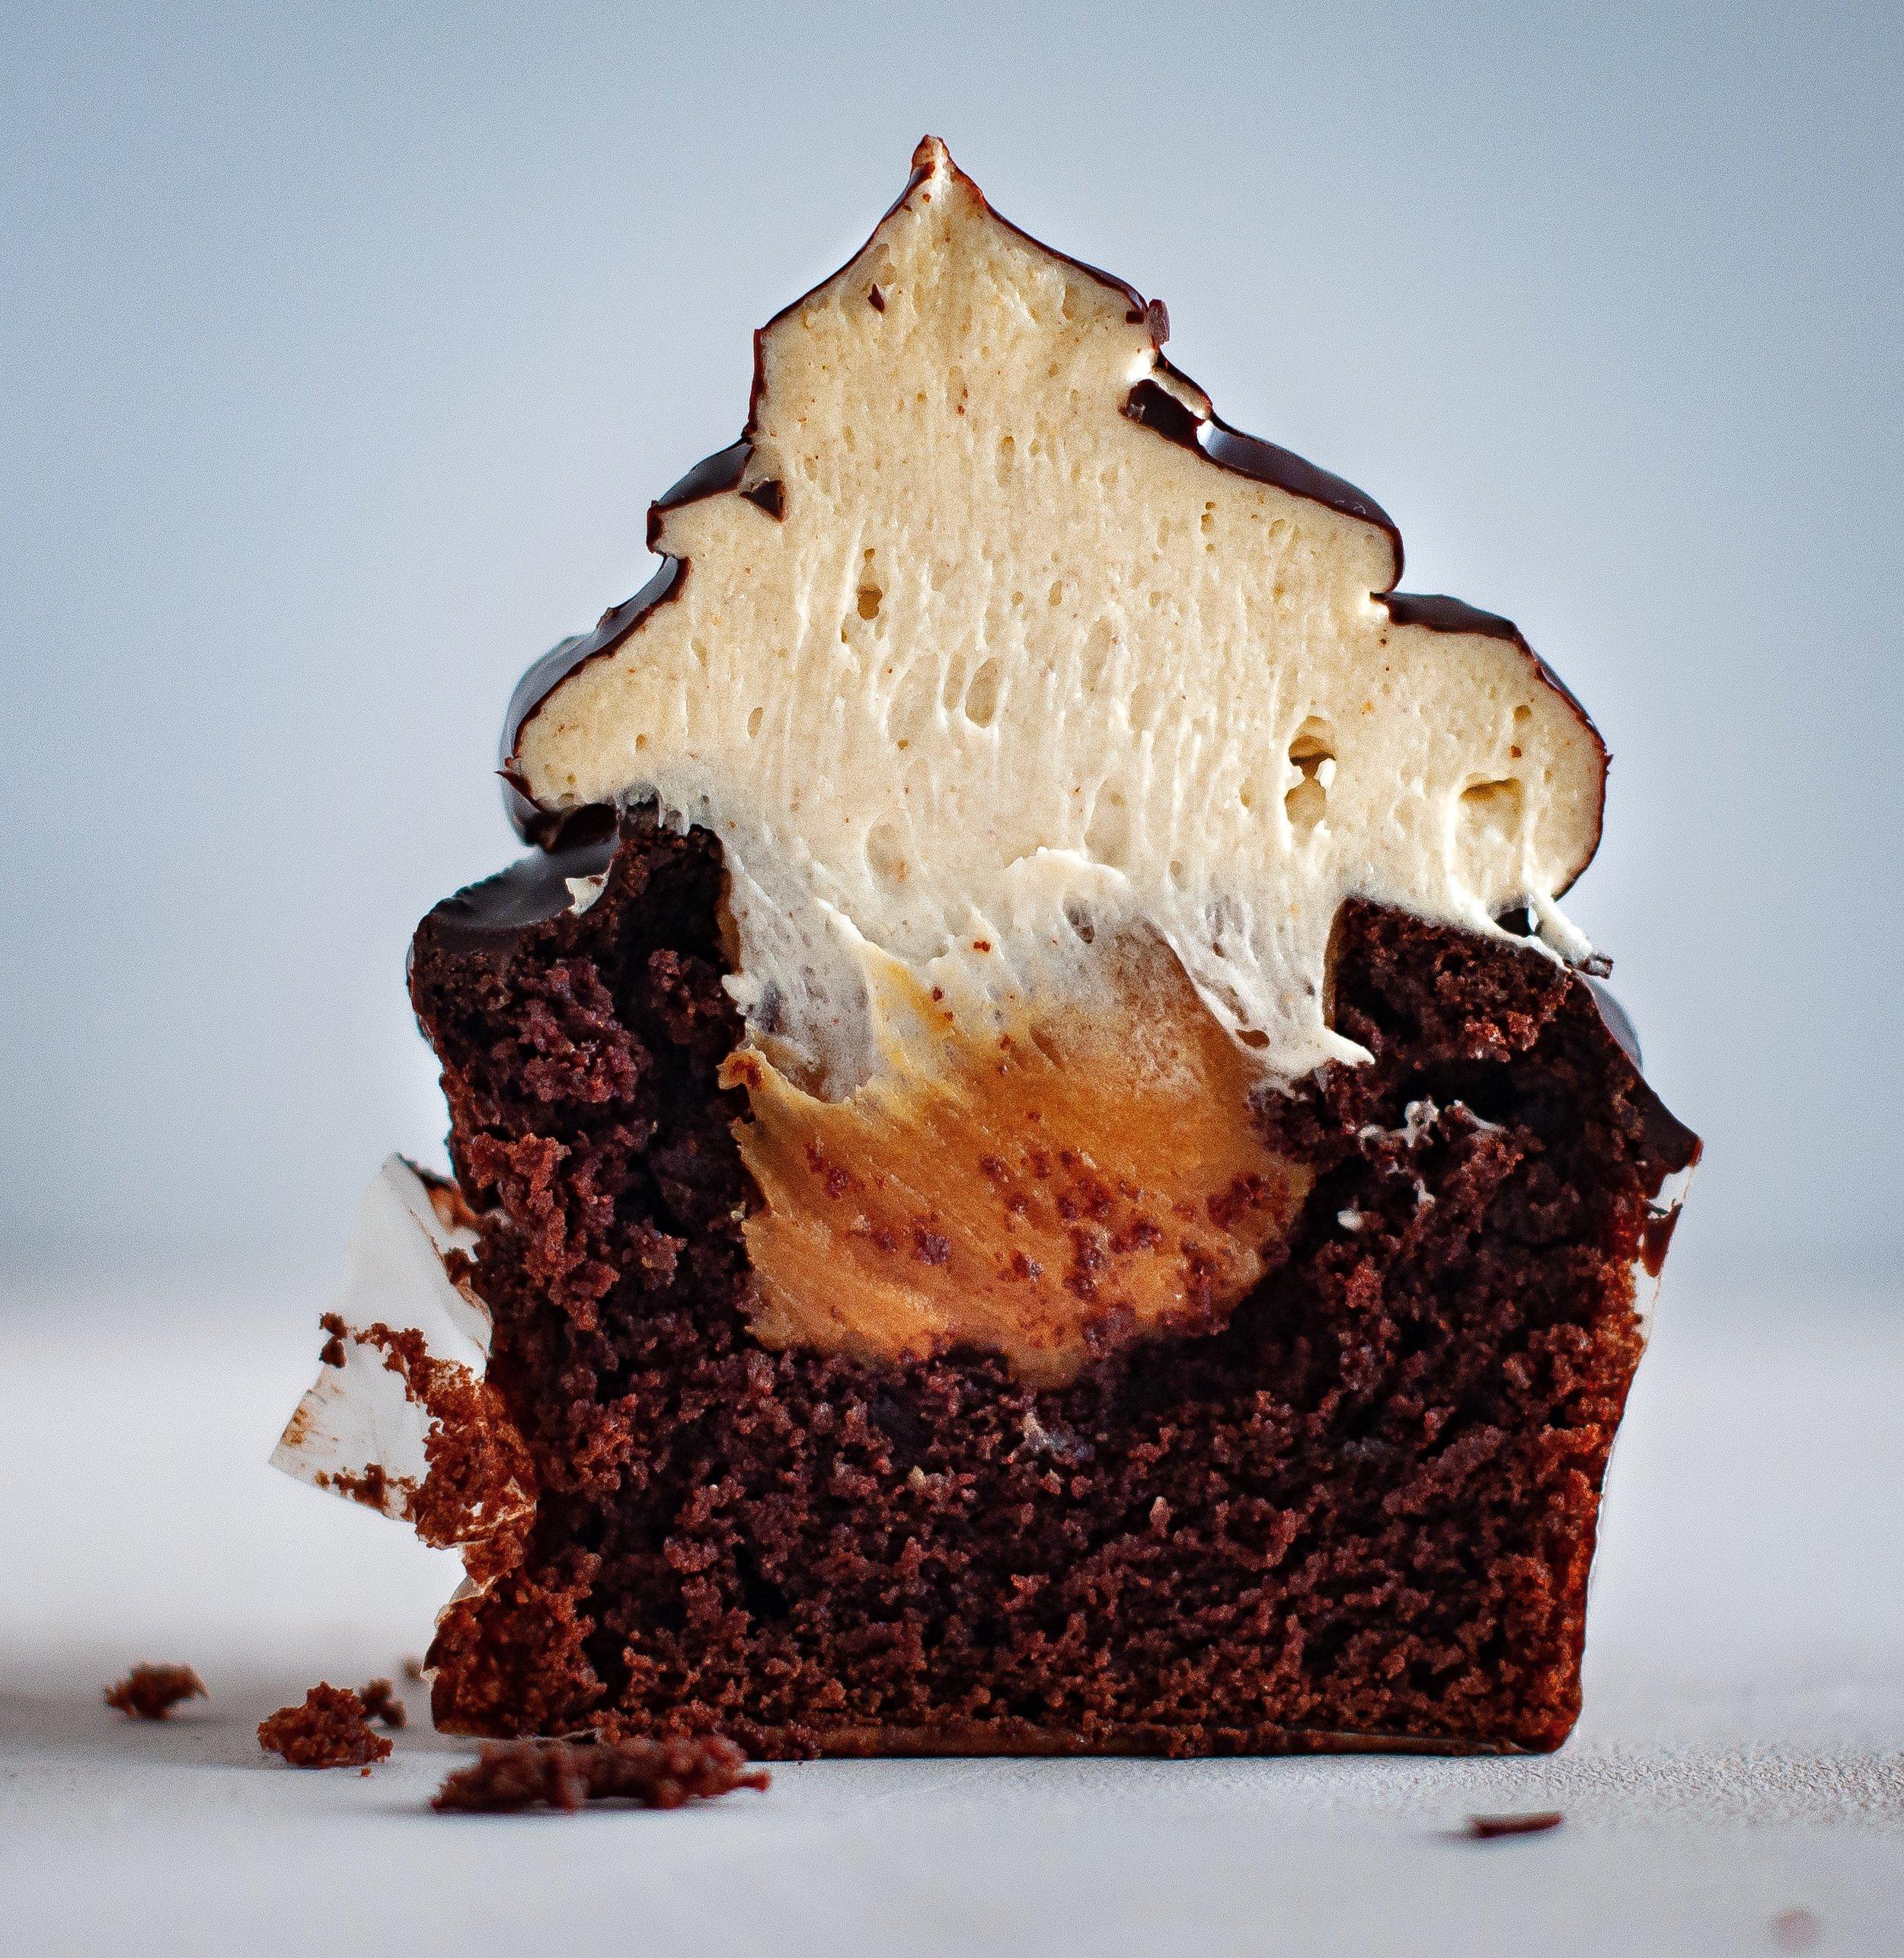 vegan cupcake cross-section